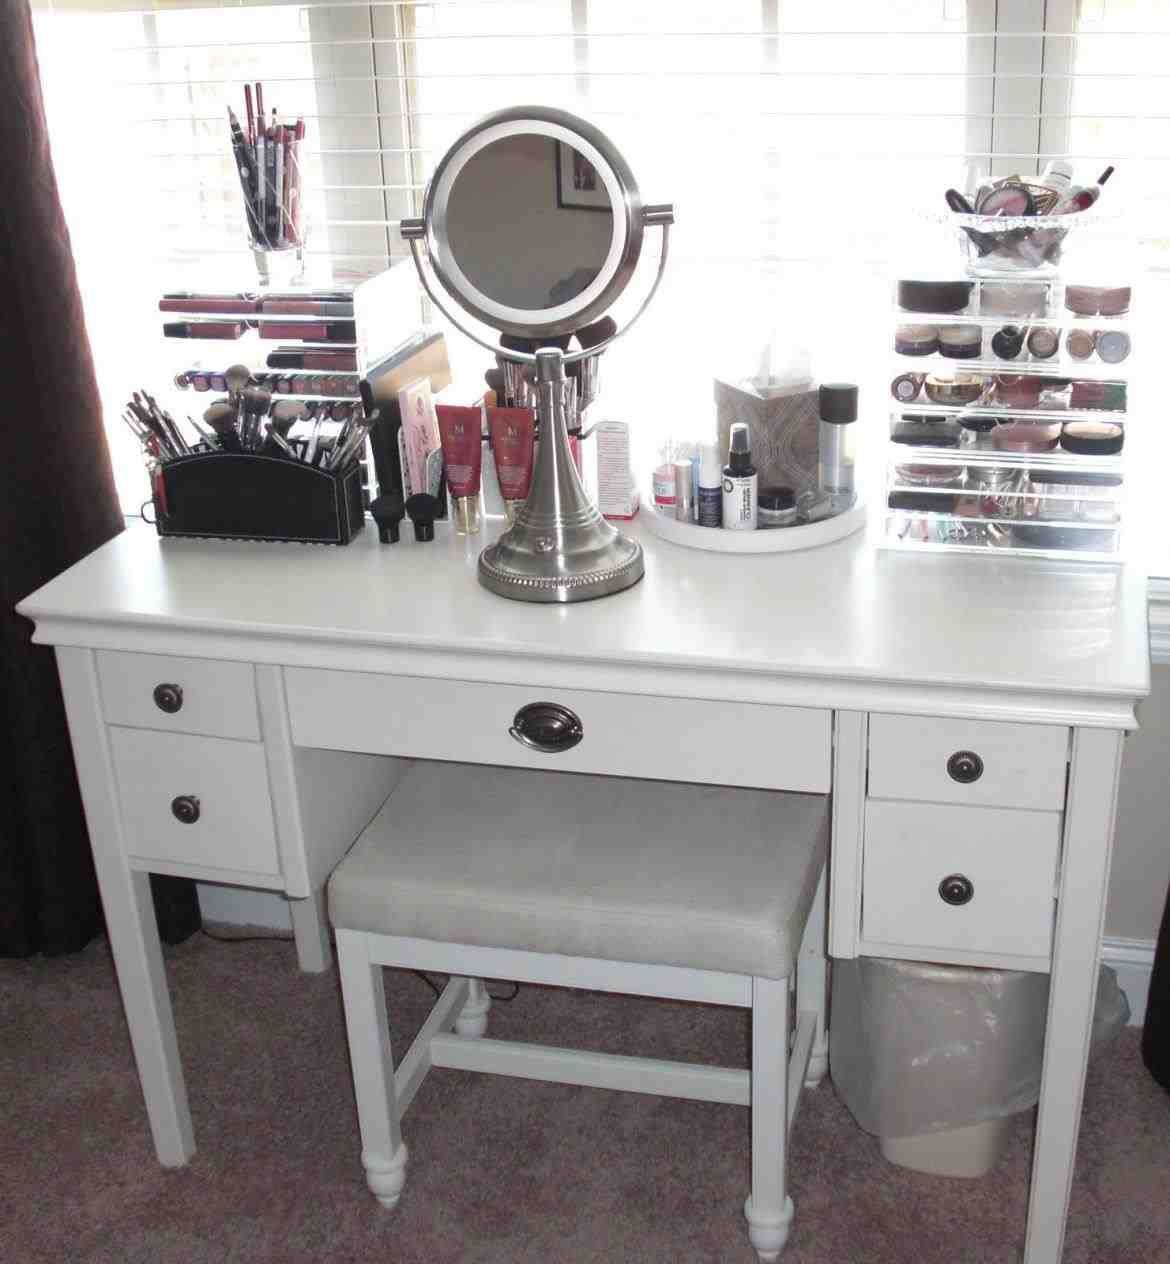 This Vanity Table Organization Ideas Pier 1 Imports Hayworth